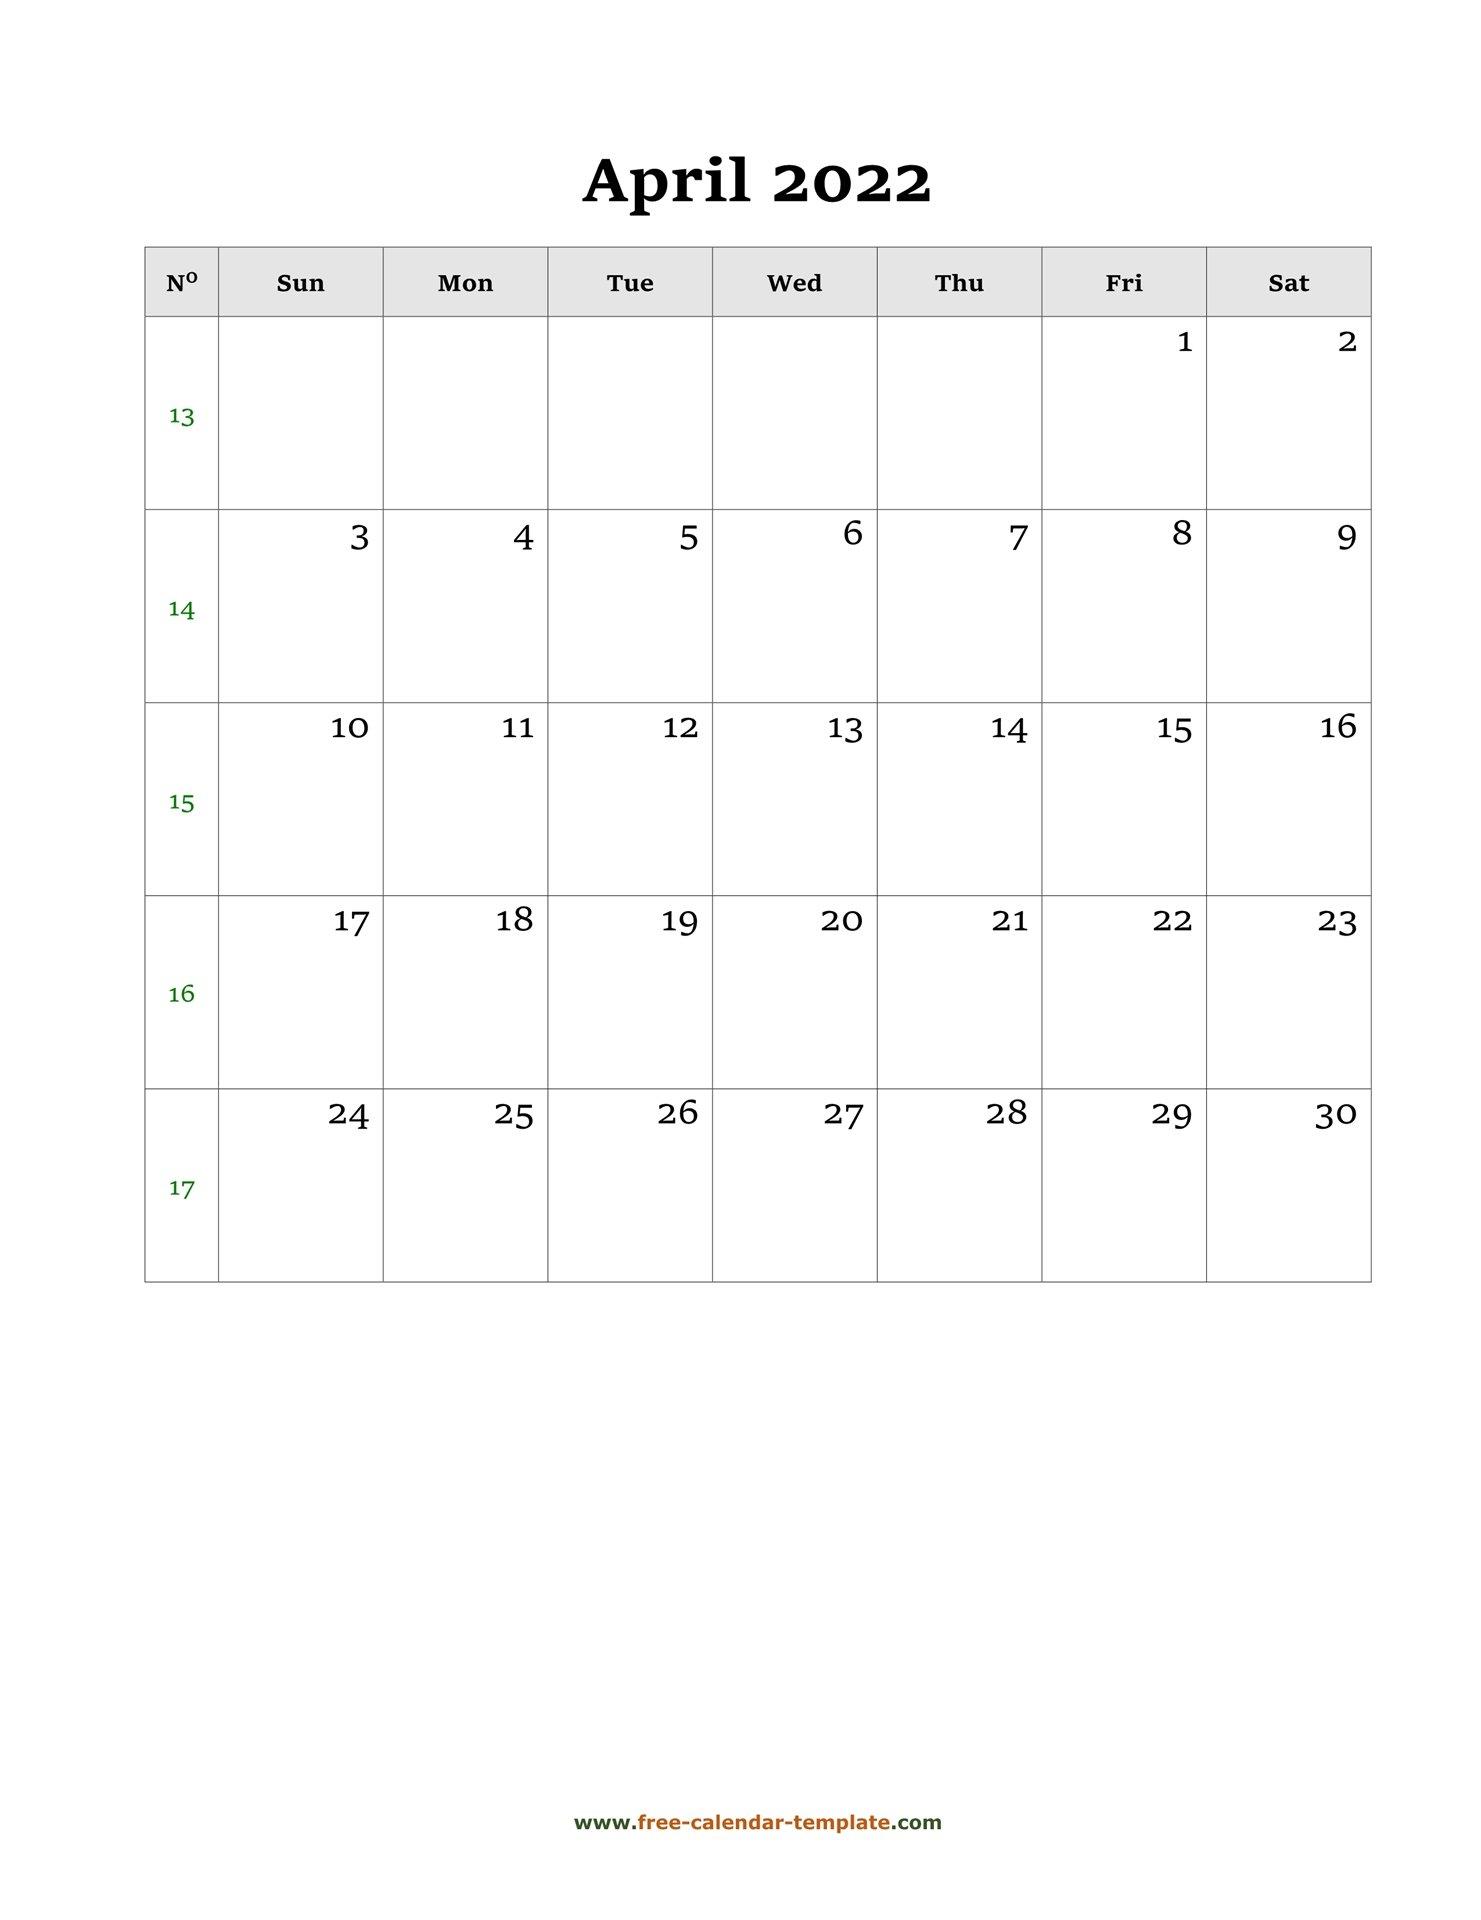 April Calendar 2022 Simple Design With Large Box On Each pertaining to Print Calendar April 2022 Photo